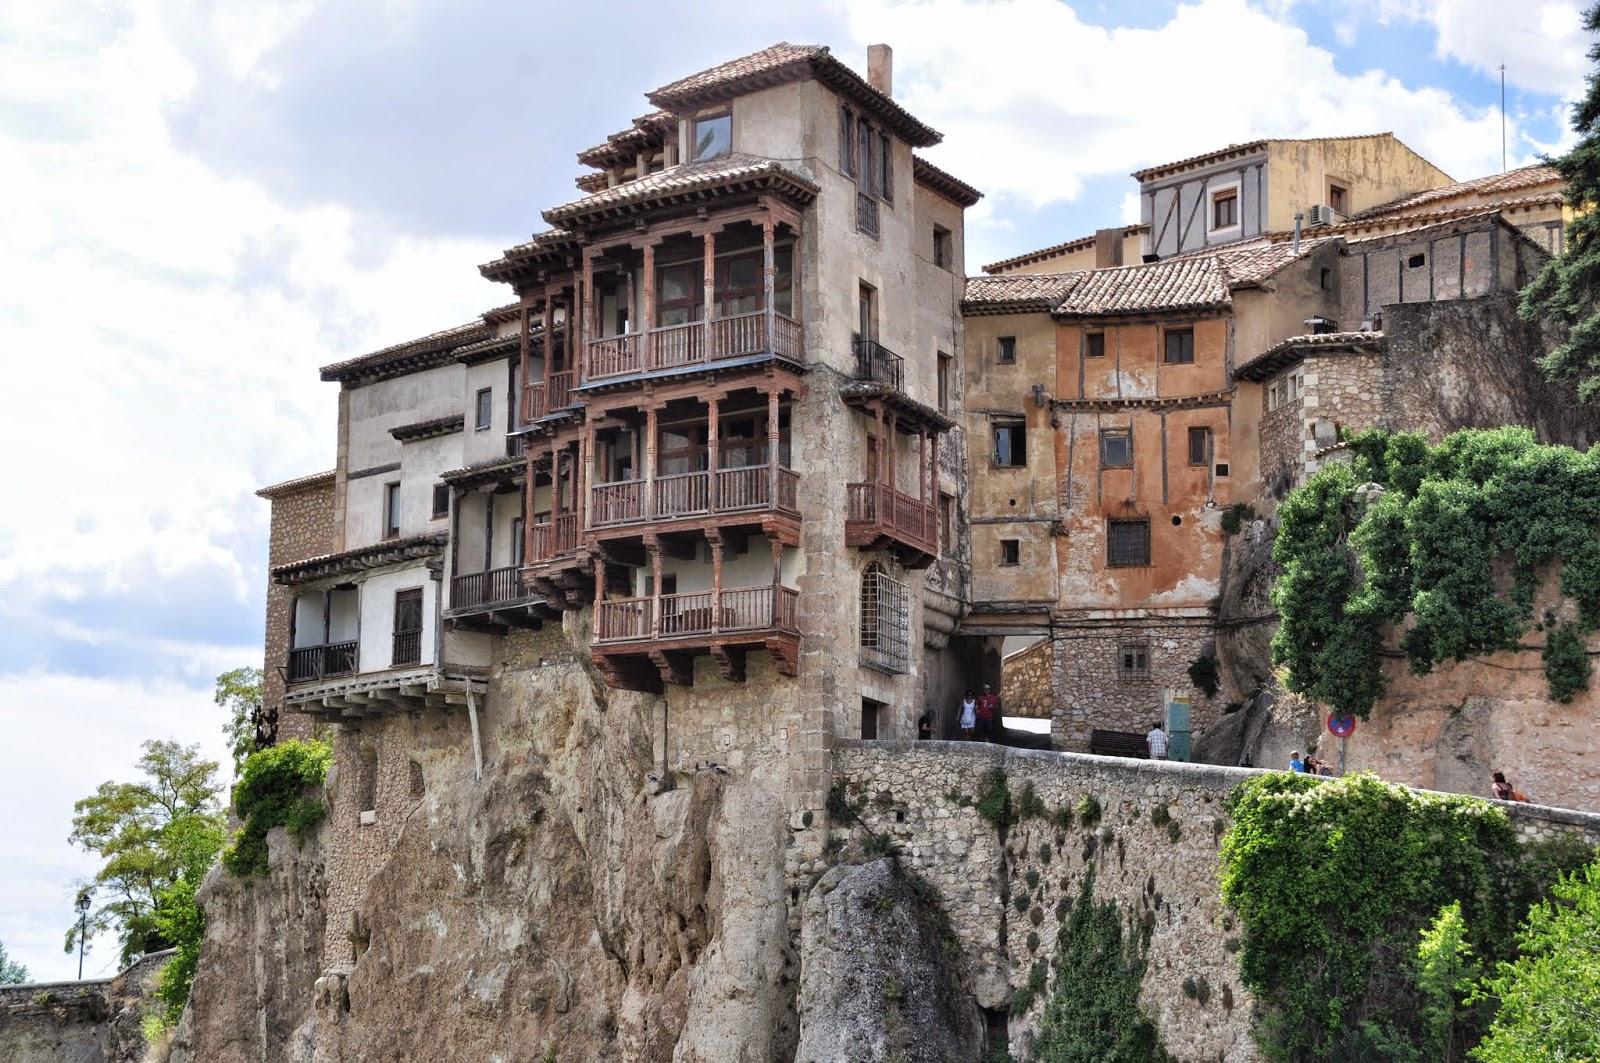 Itinerario in Spagna - Cuenca